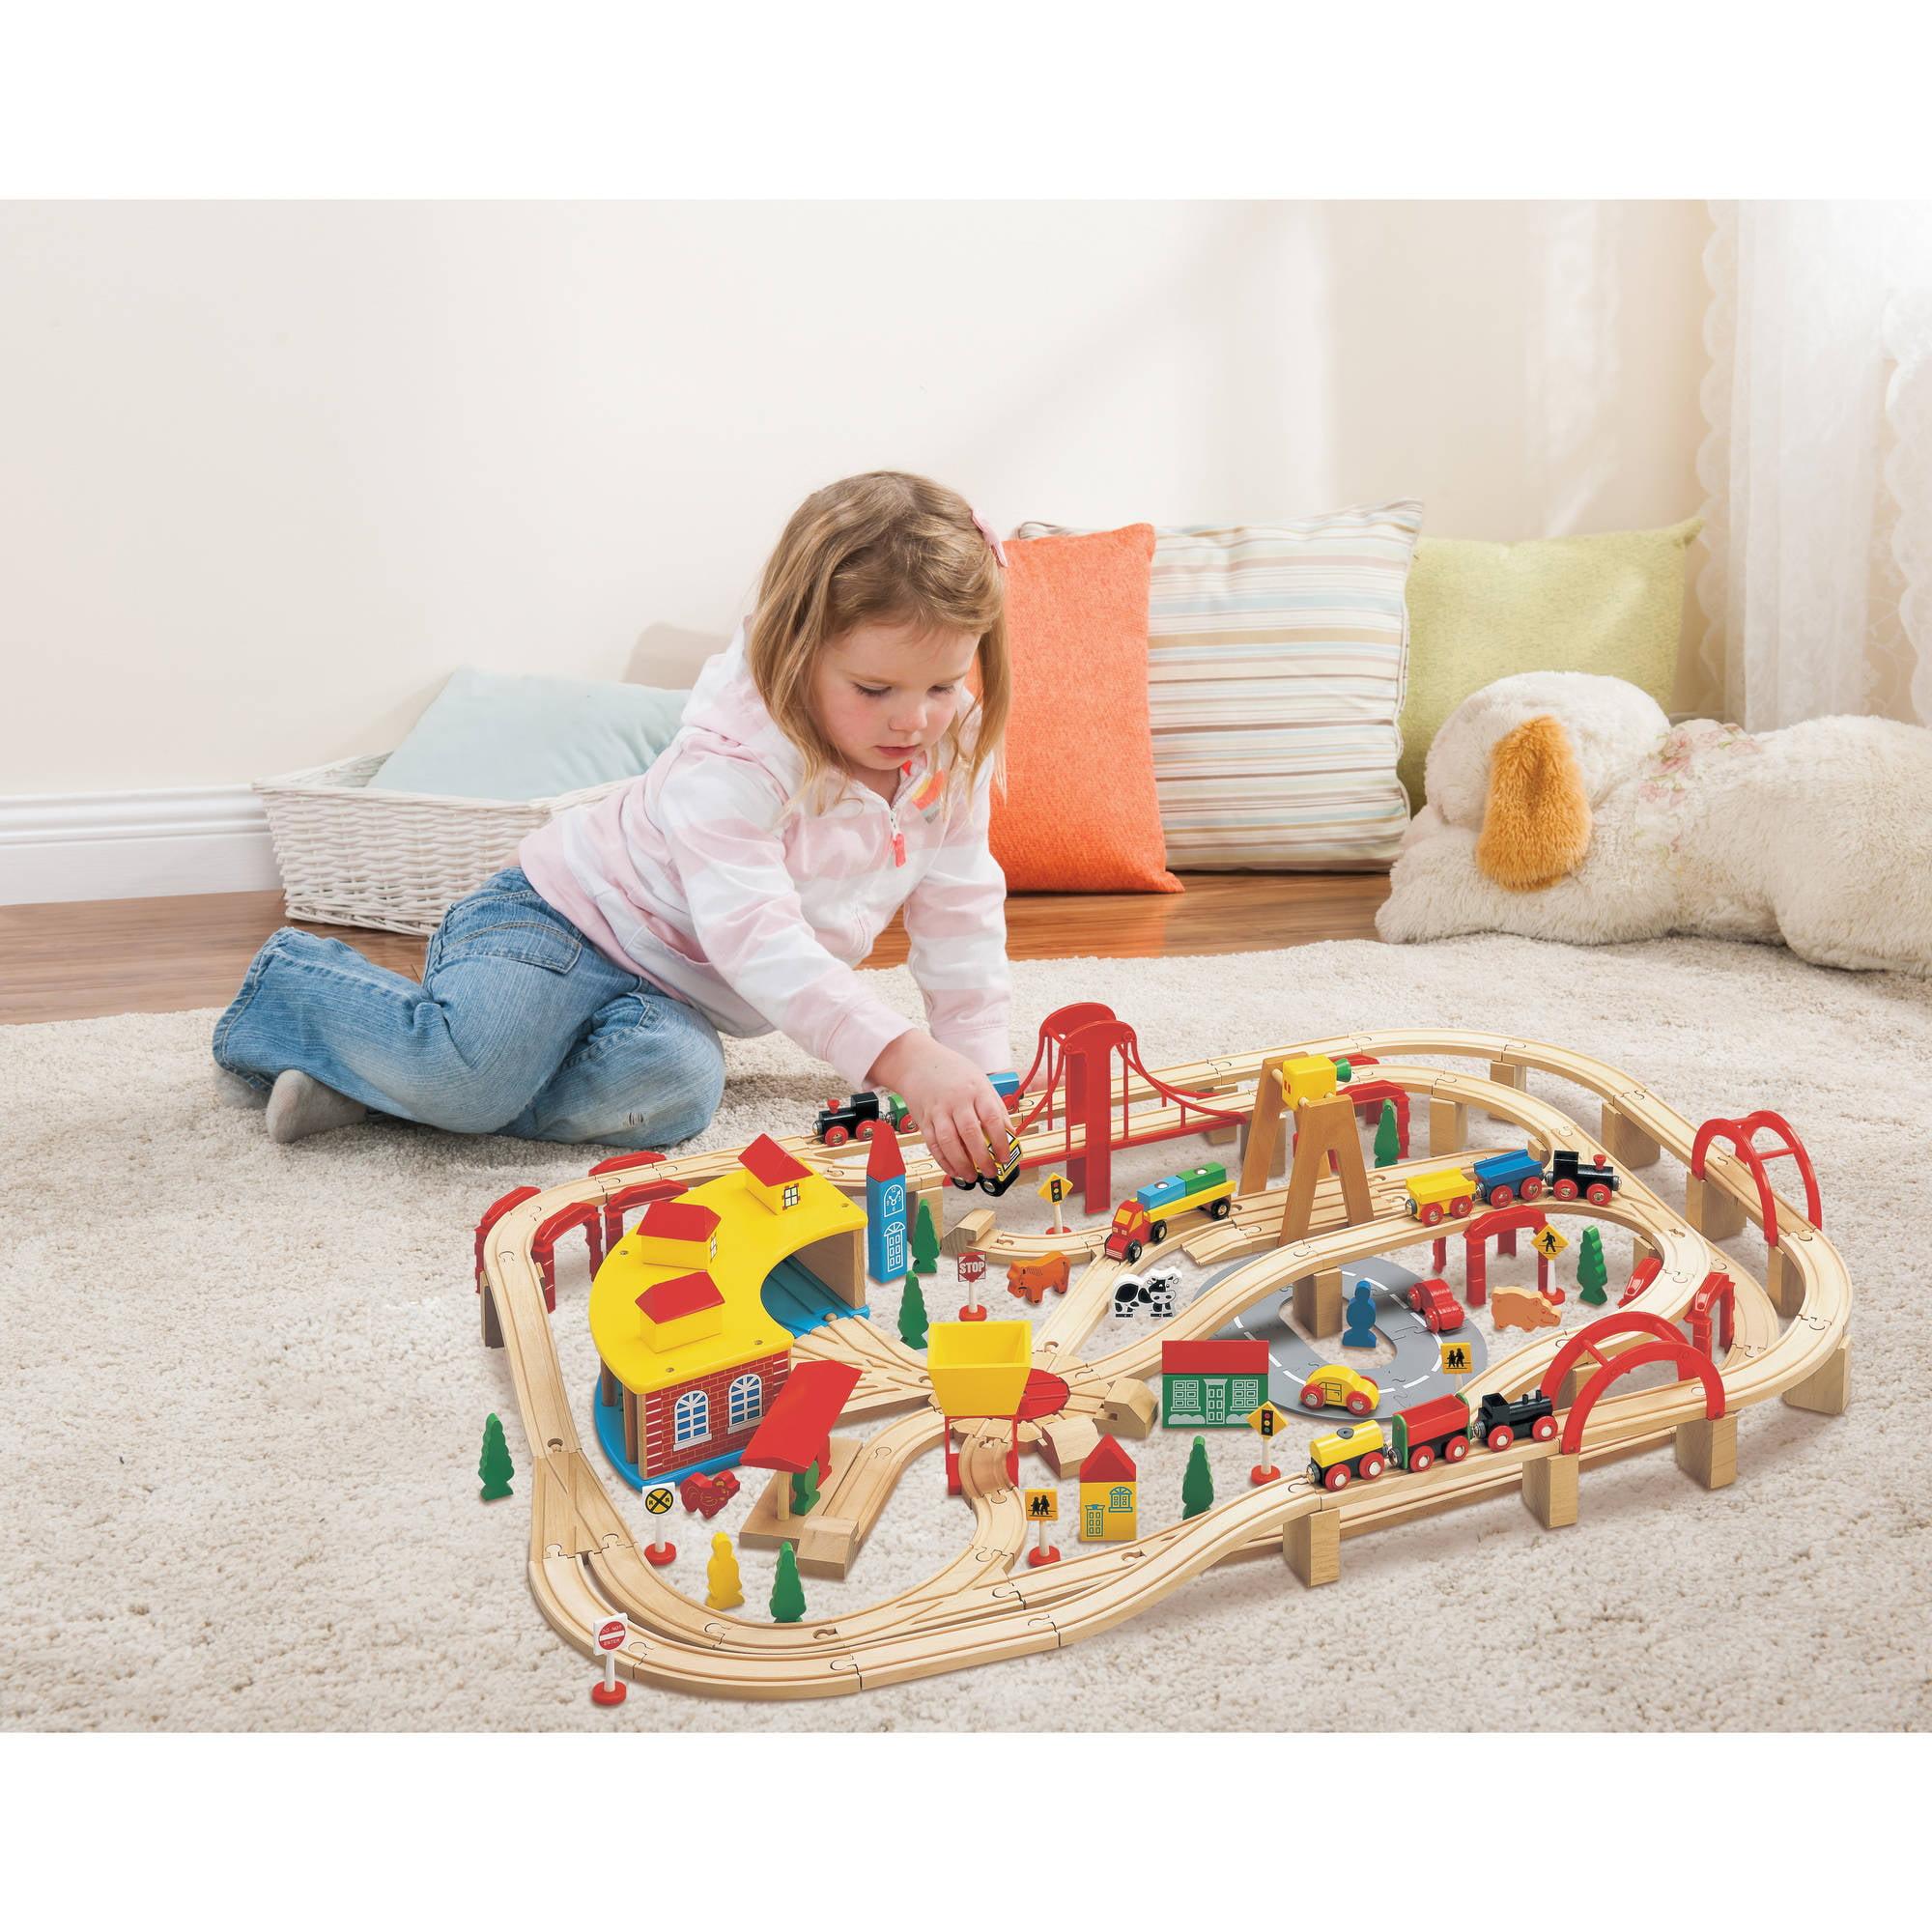 Wooden Train Play Set, 145-Piece - Walmart.com